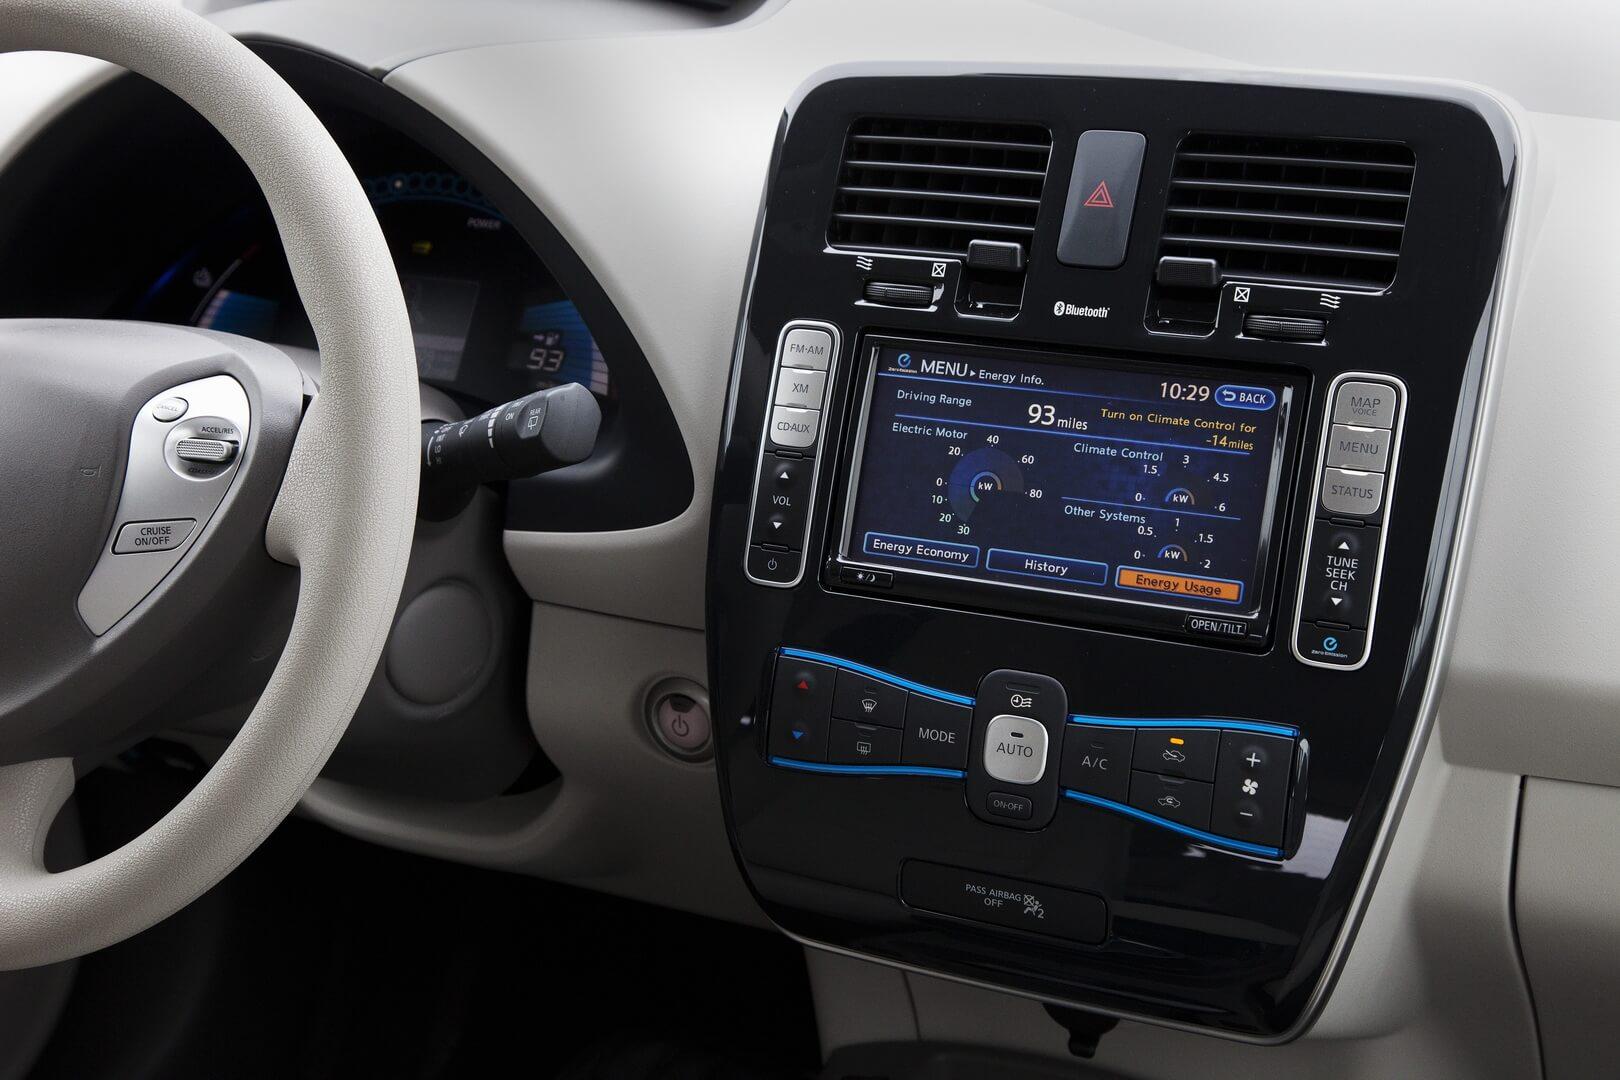 Фотография экоавто Nissan Leaf 2010 (24 кВт•ч) - фото 50